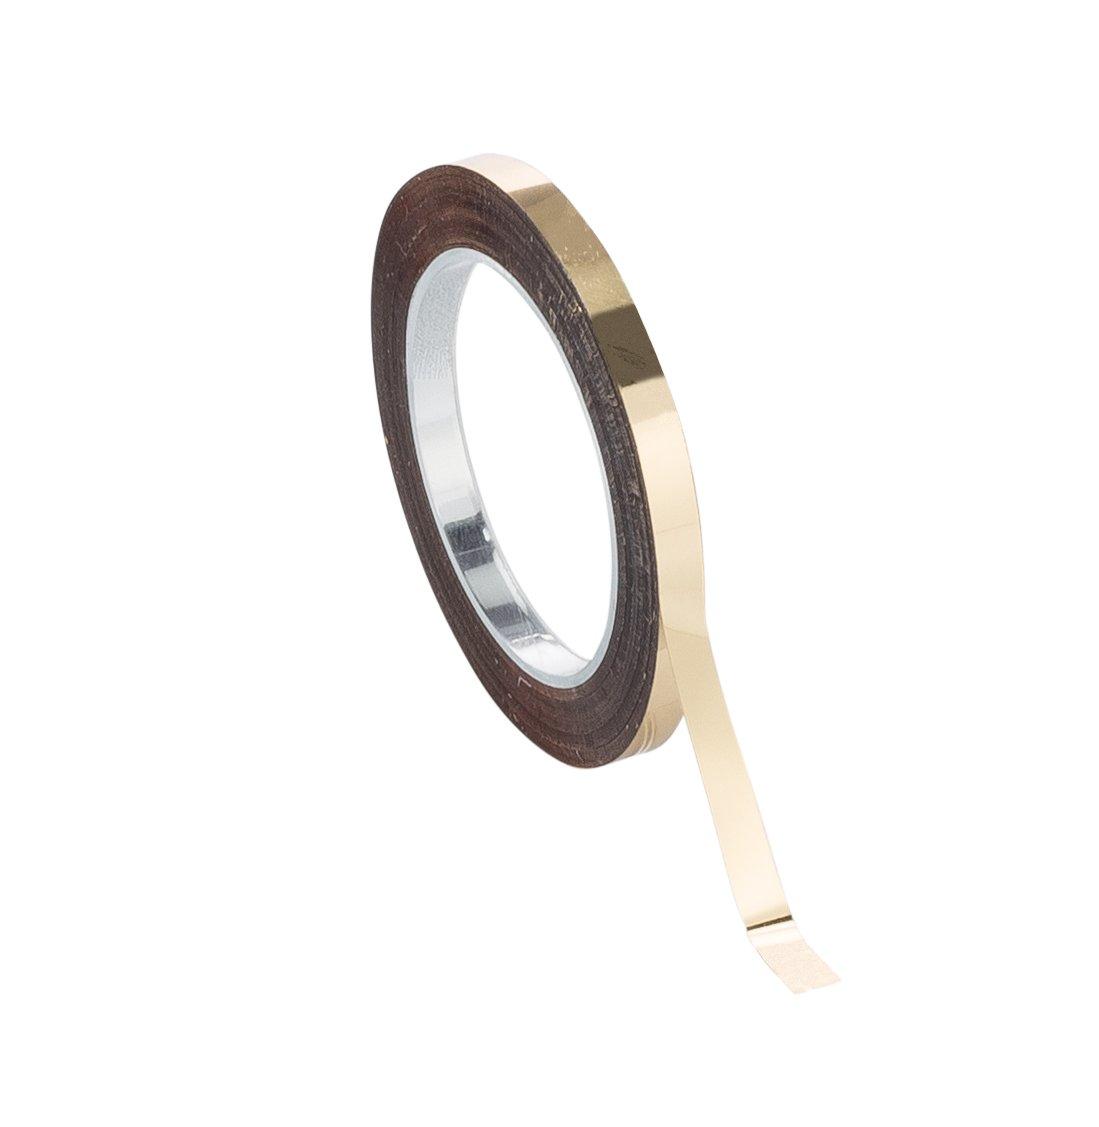 Chartpak Graphic Art Tape, 1/8 W x 324 L Inches, Gold Mylar Metallic, 1 Roll (BG12509)